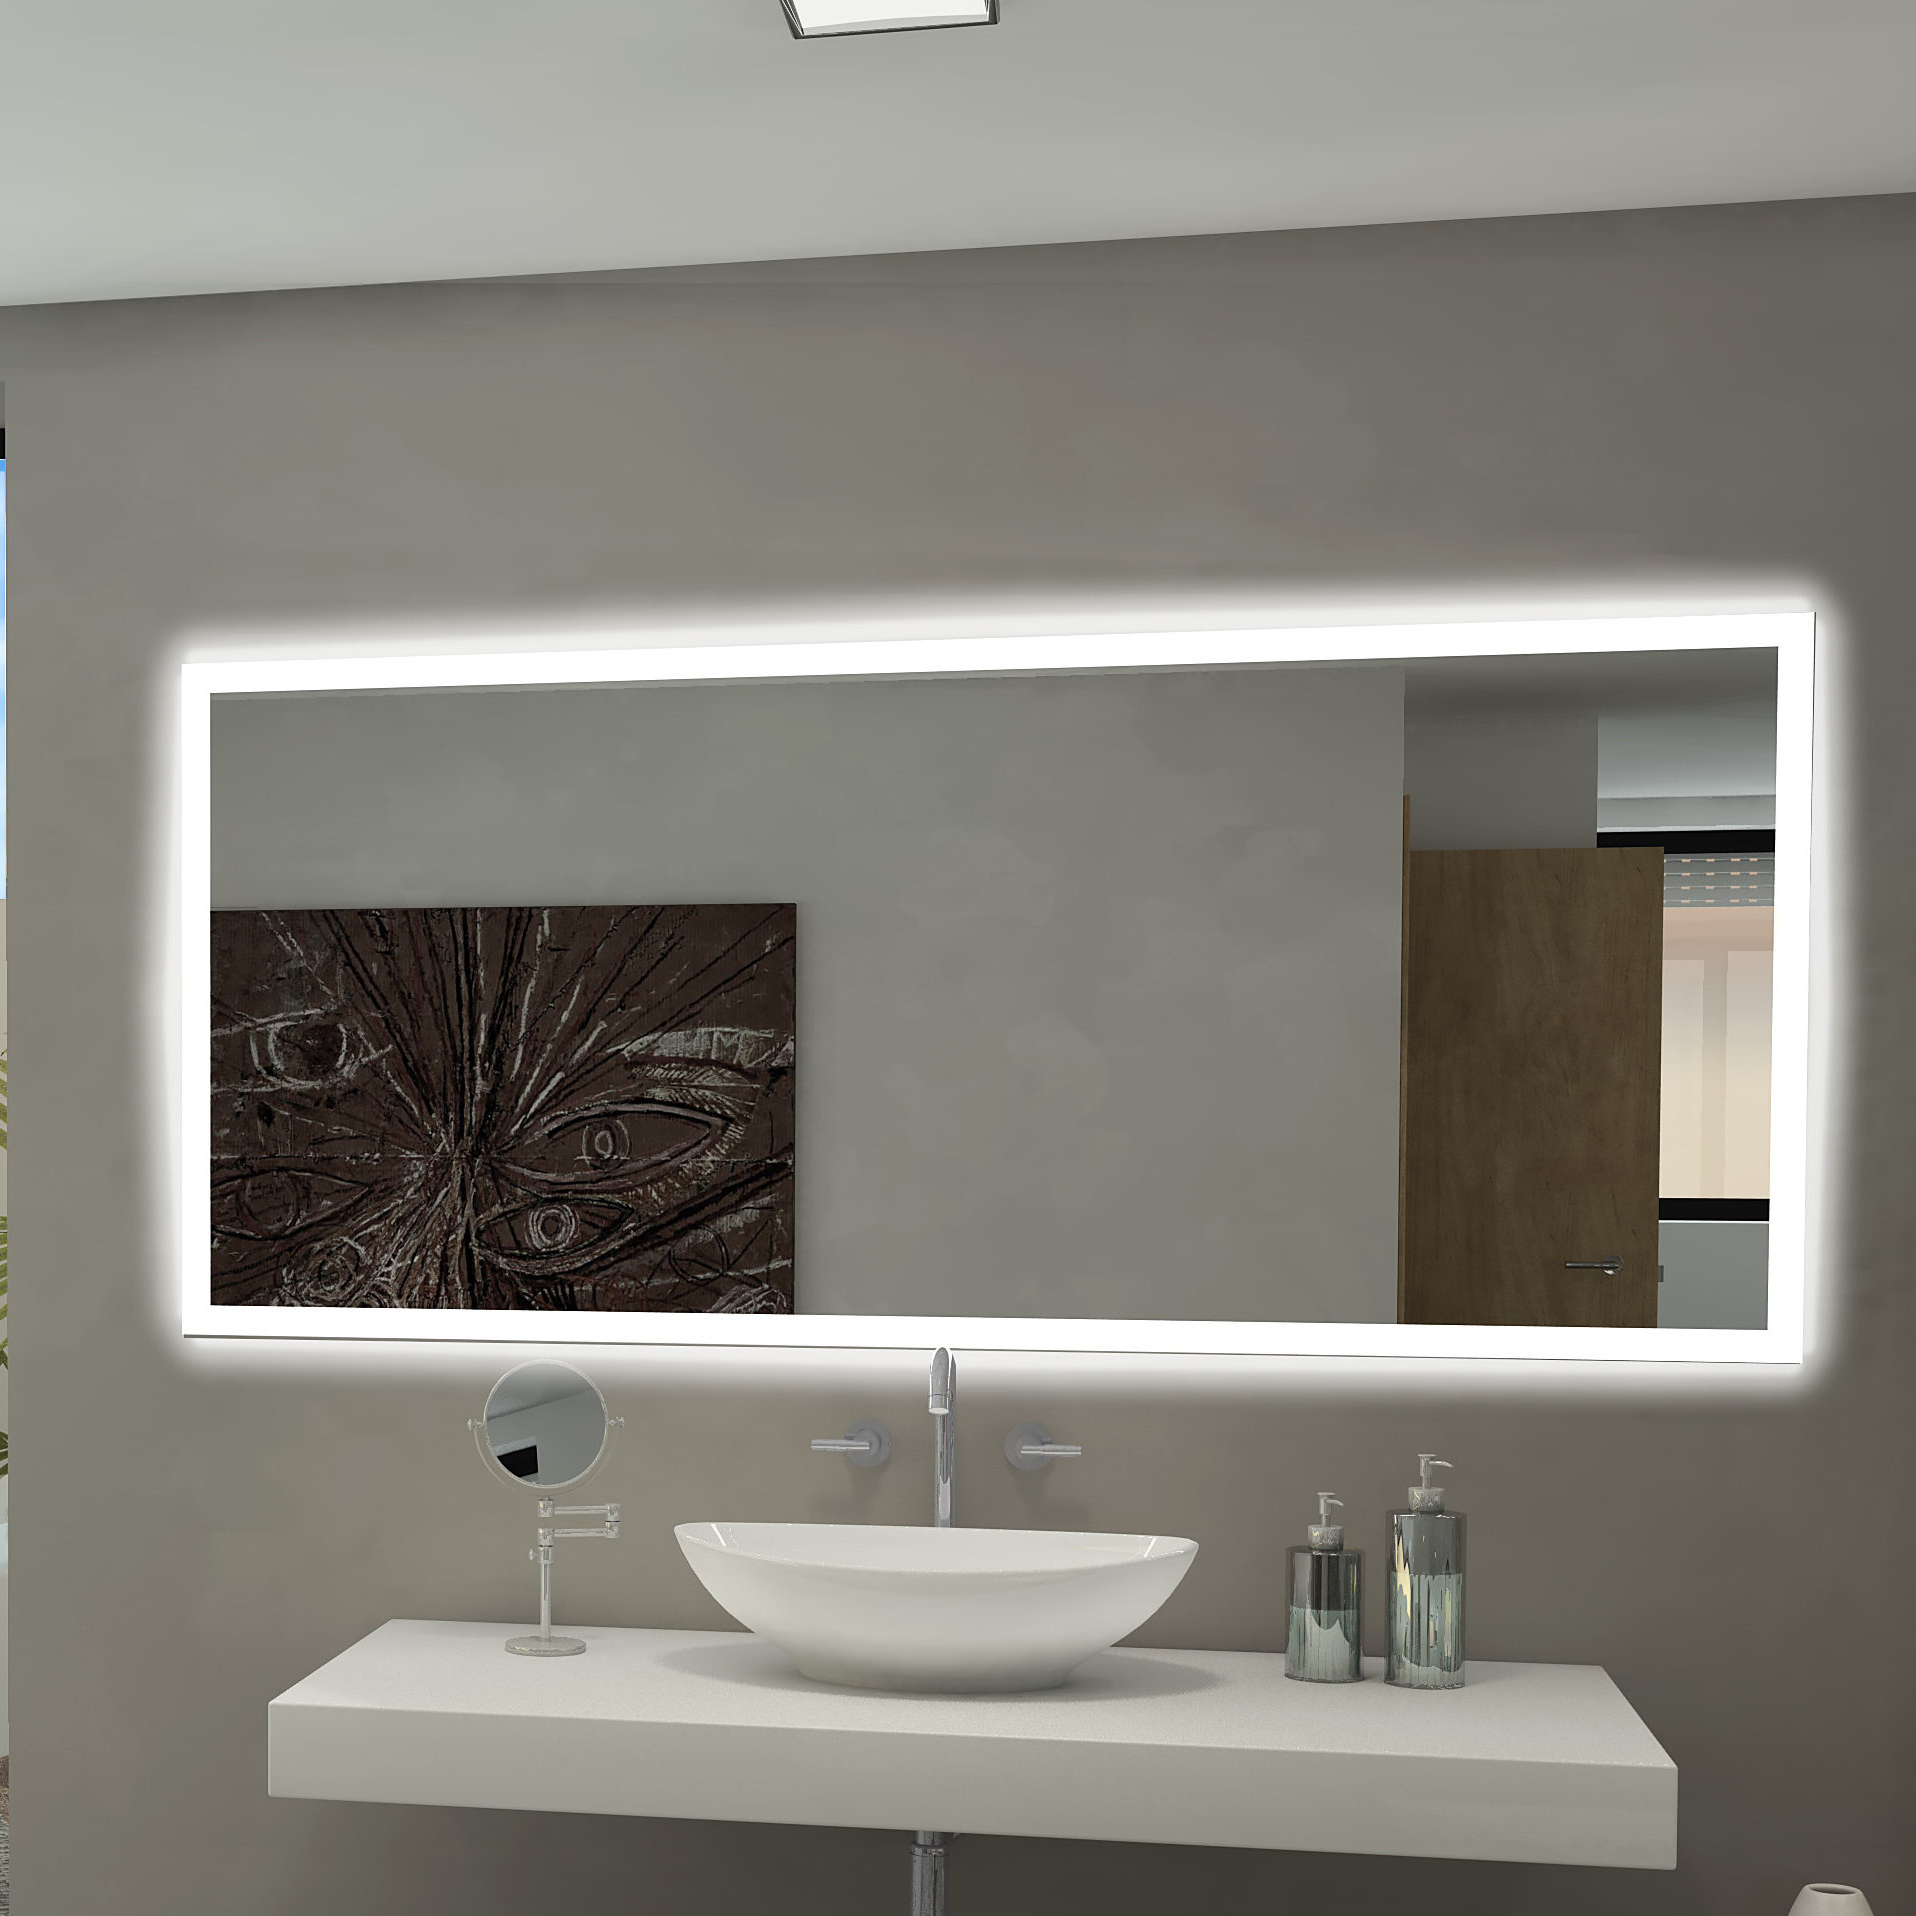 Rectangle Backlit Bathroom/vanity Wall Mirror In Well Known Vanity Wall Mirrors For Bathroom (Gallery 1 of 20)